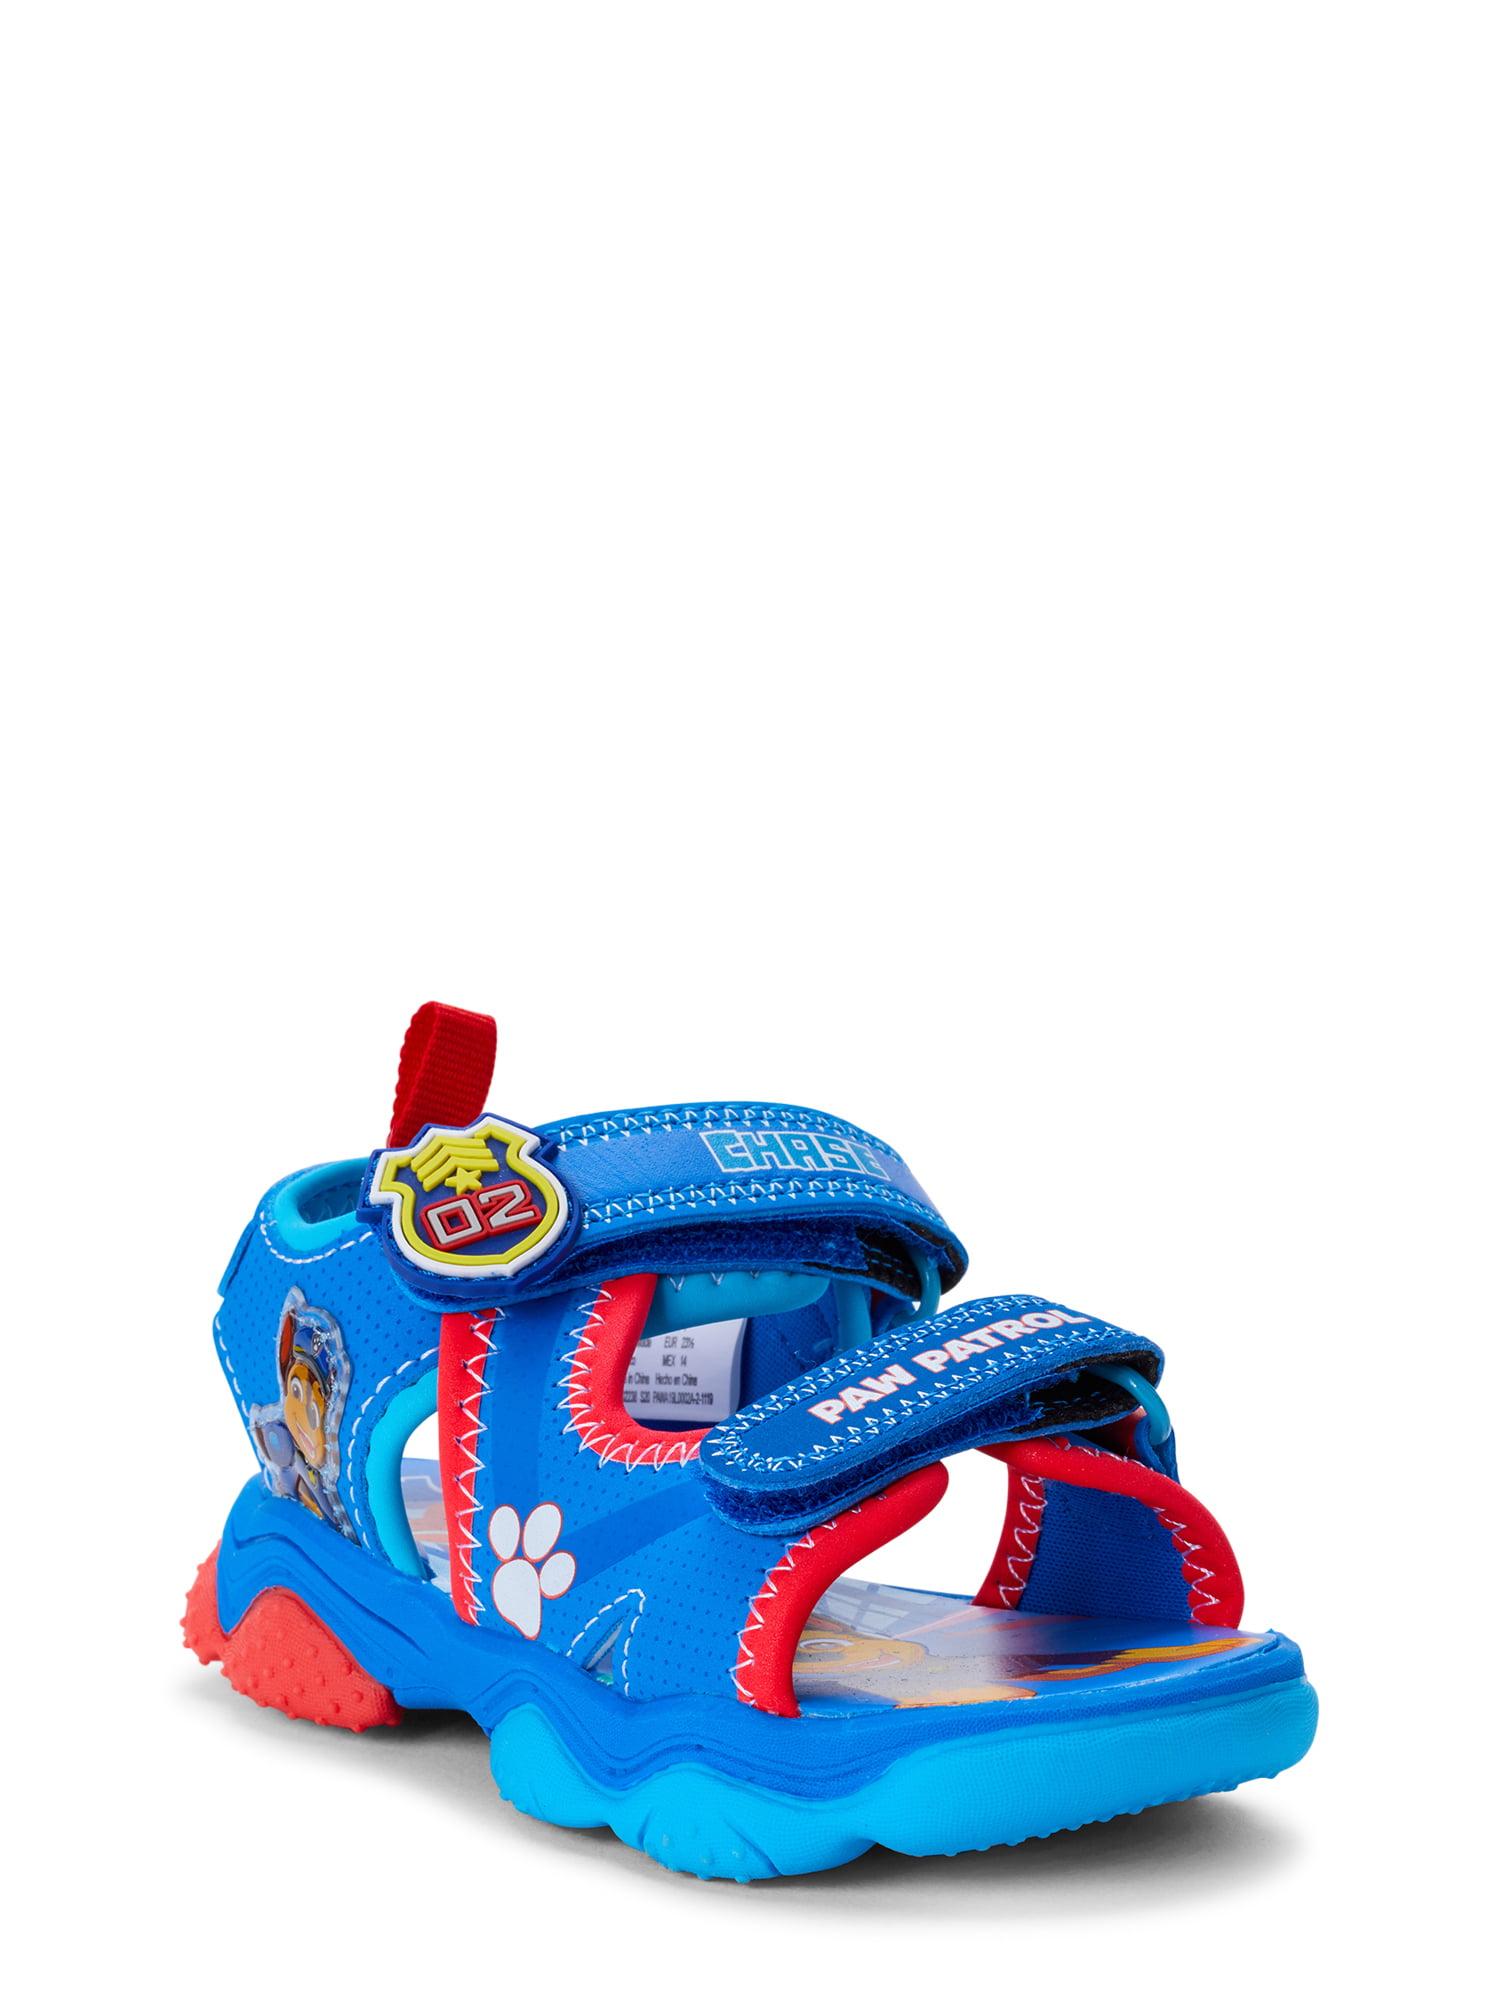 Nickelodeon Paw Patrol Open Toe Sandal